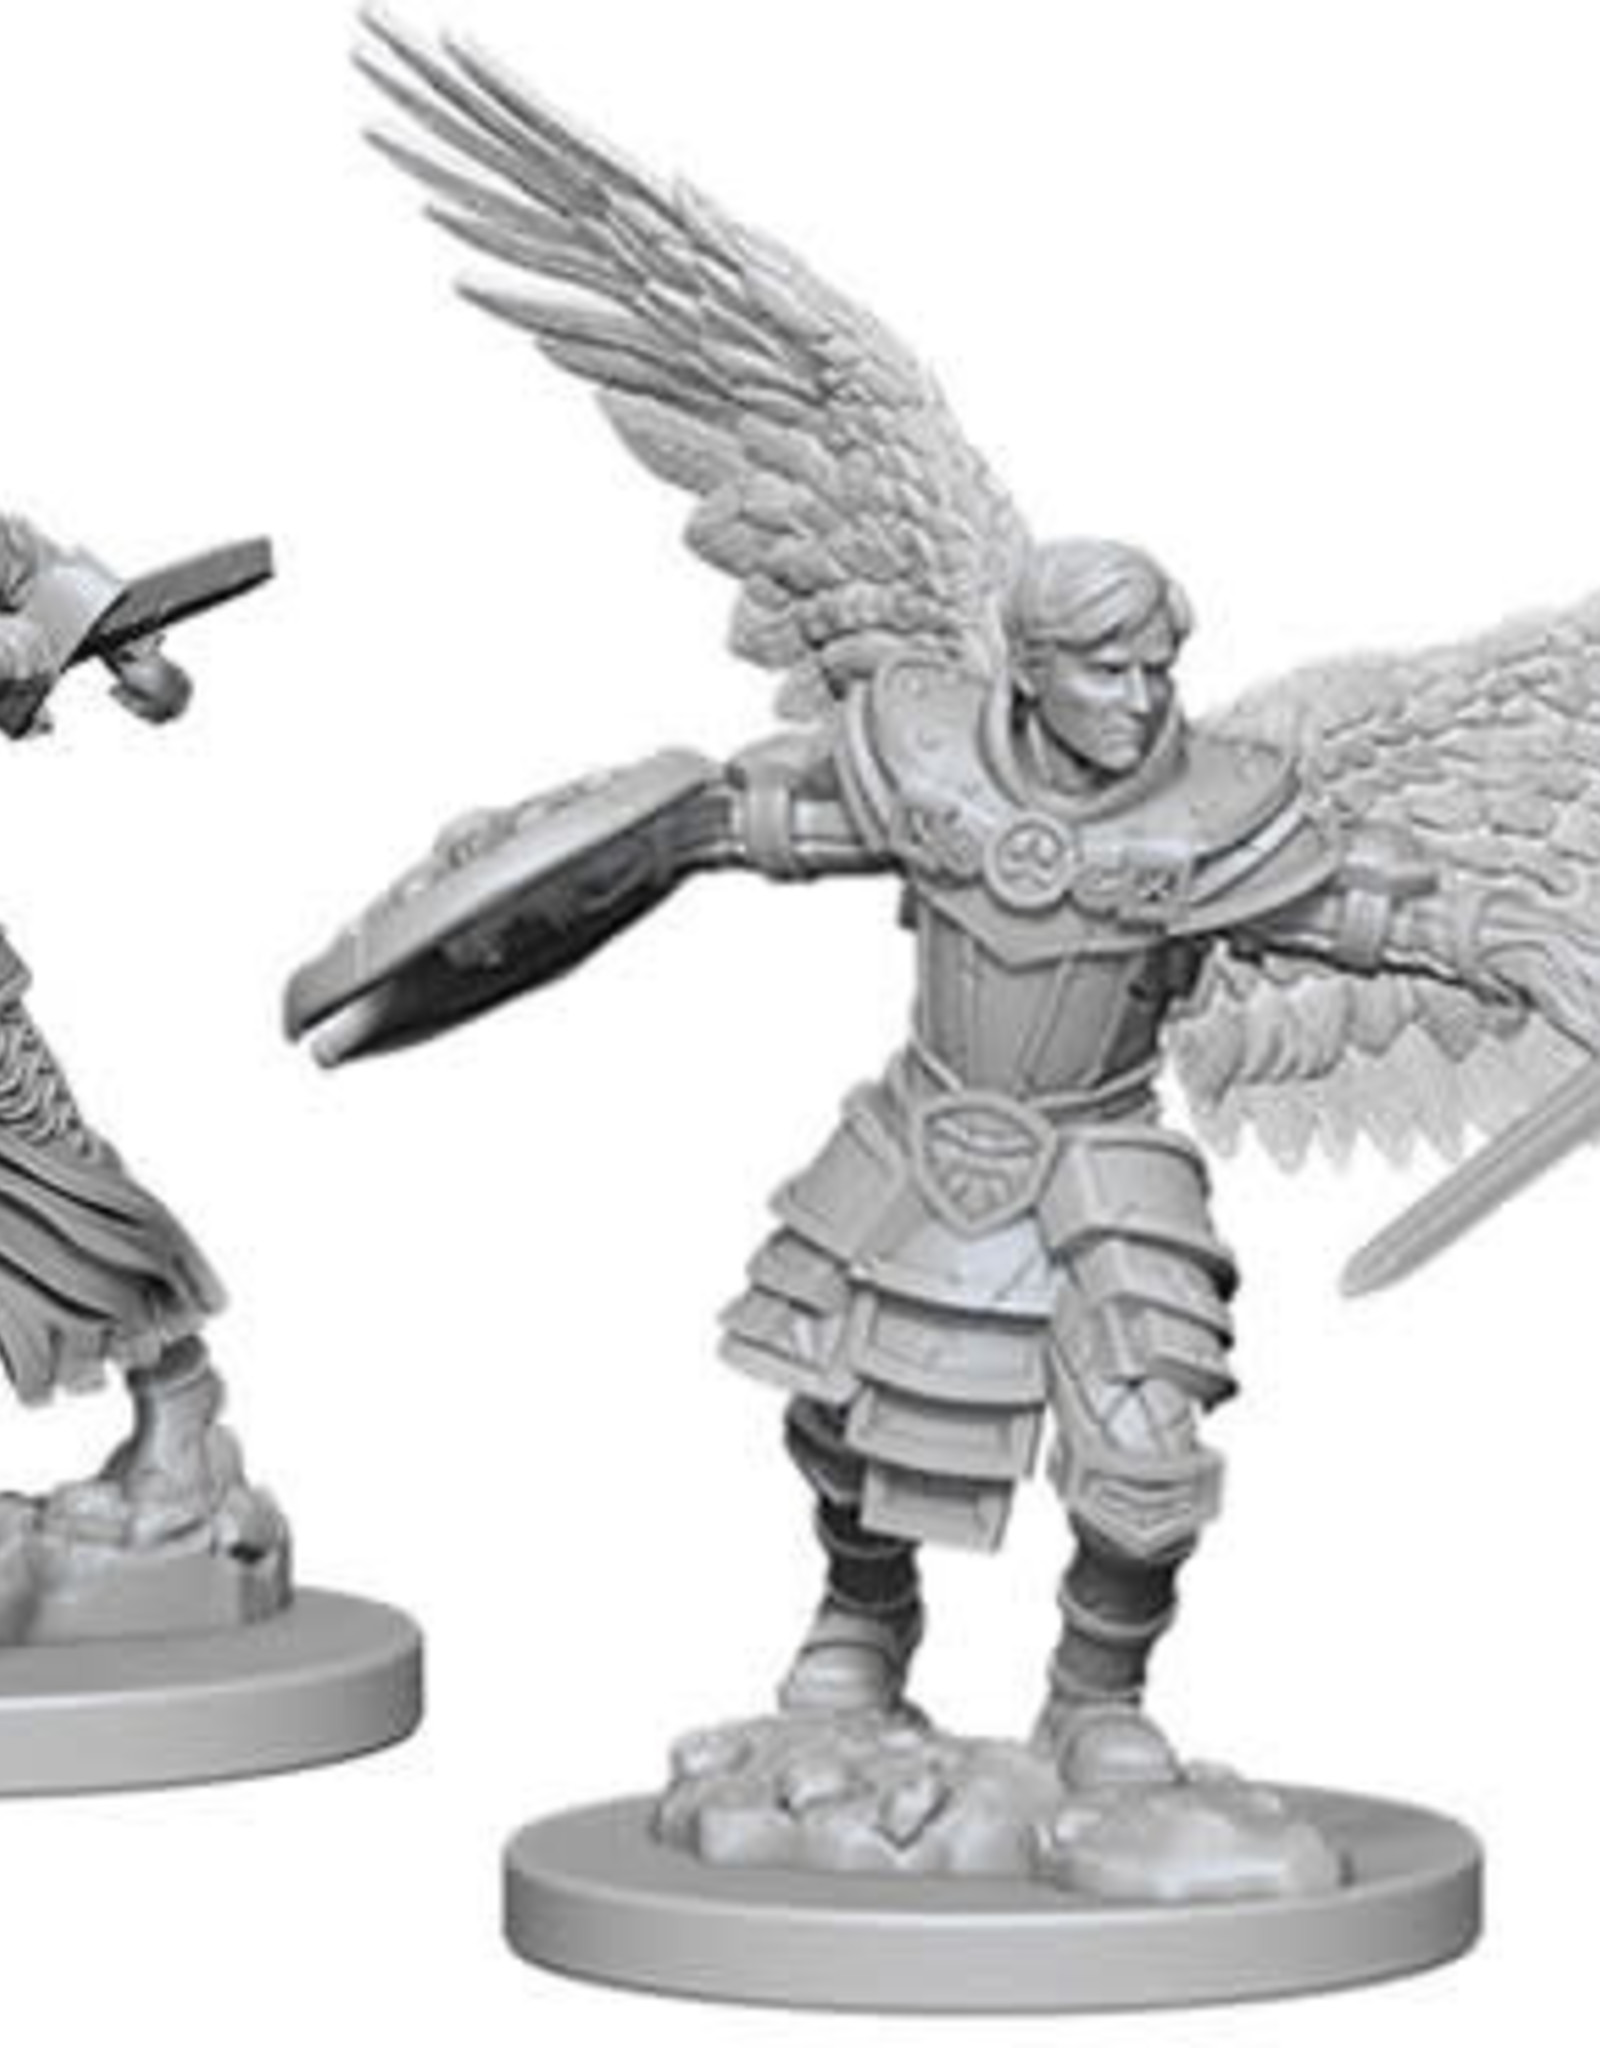 WizKids D&D Nolzur Aasimar Fighter  (He/Him/They/Them)